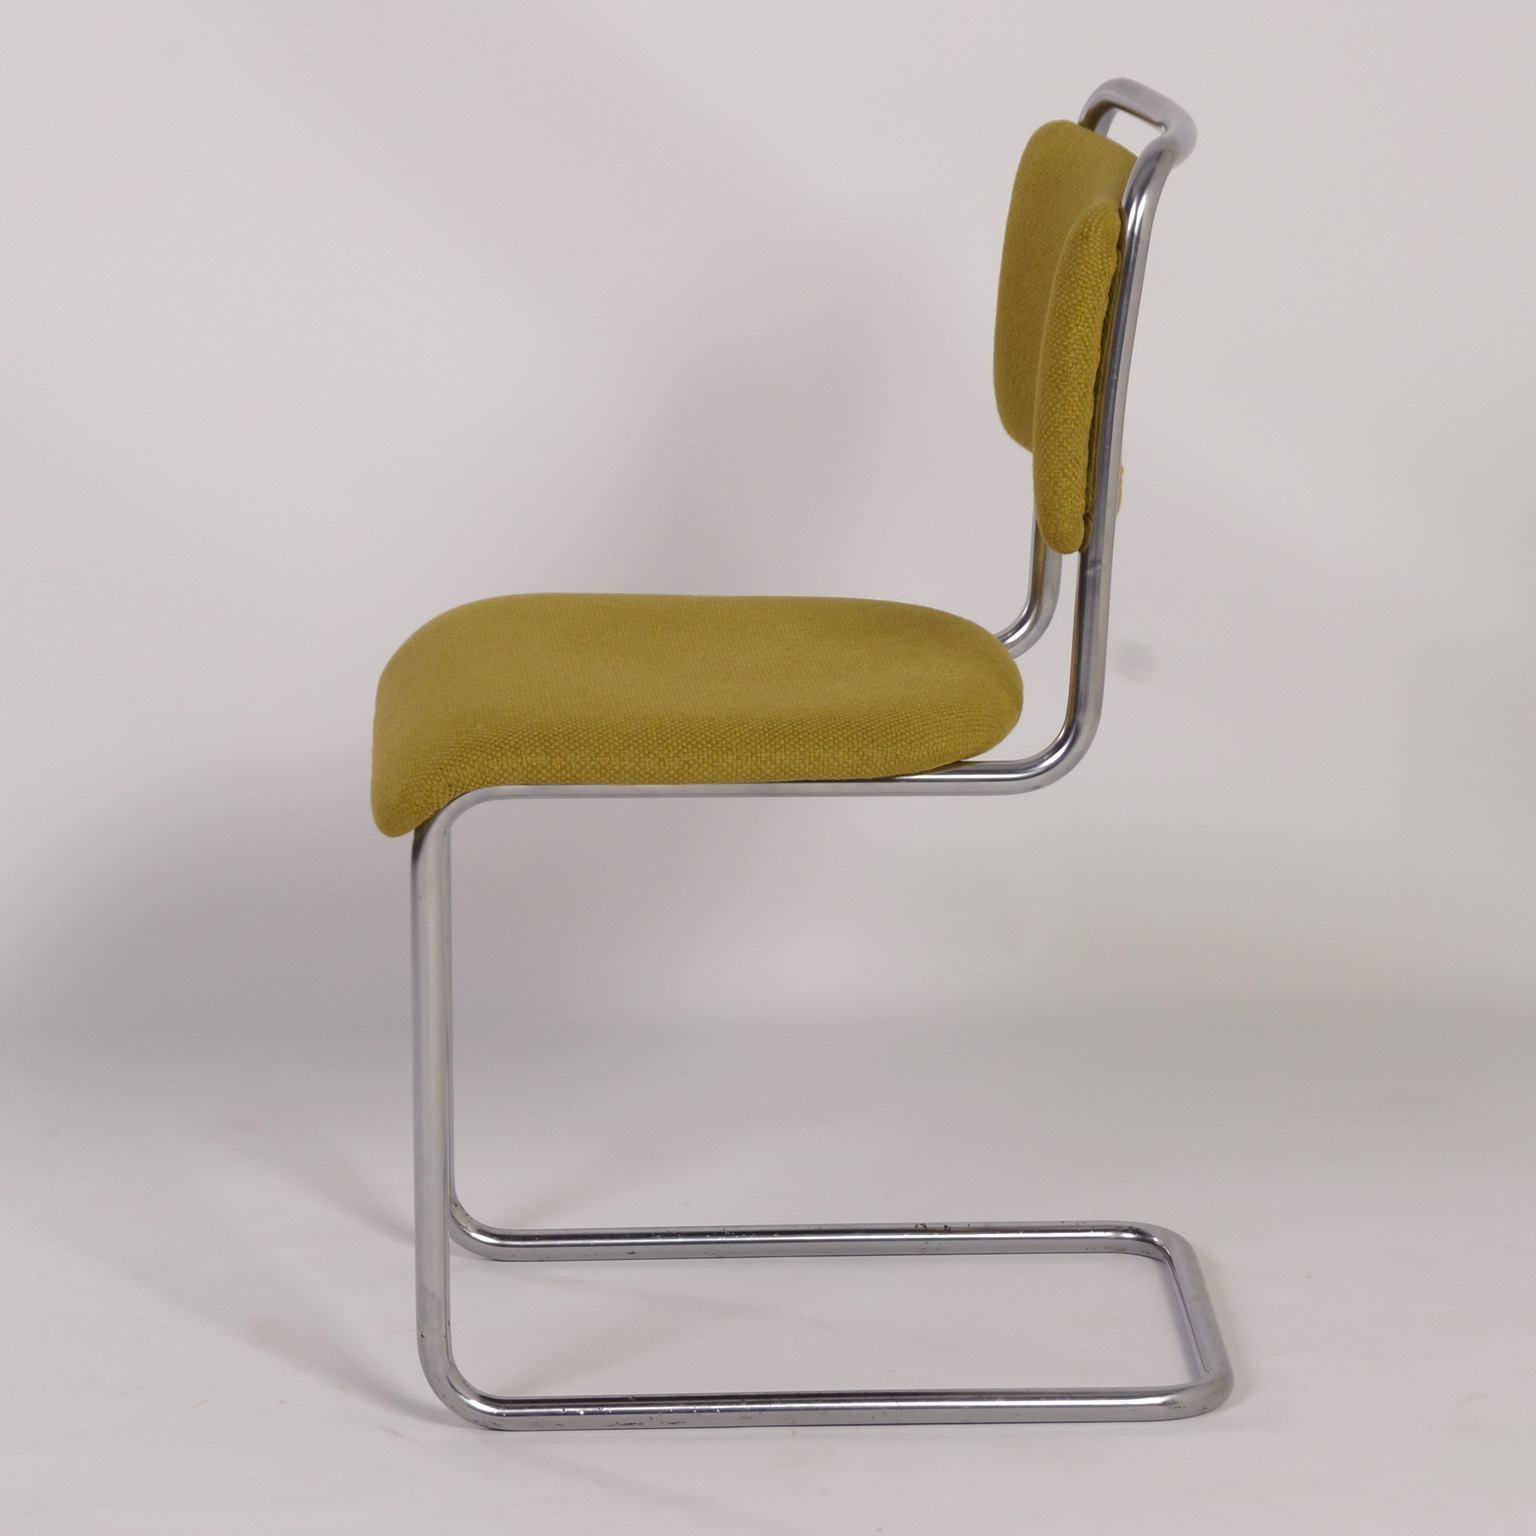 Originele Gispen Bureaustoel.Vintage Gispen 101 Stoel Van W H Gispen 1930s Nieuwe Ploegstof